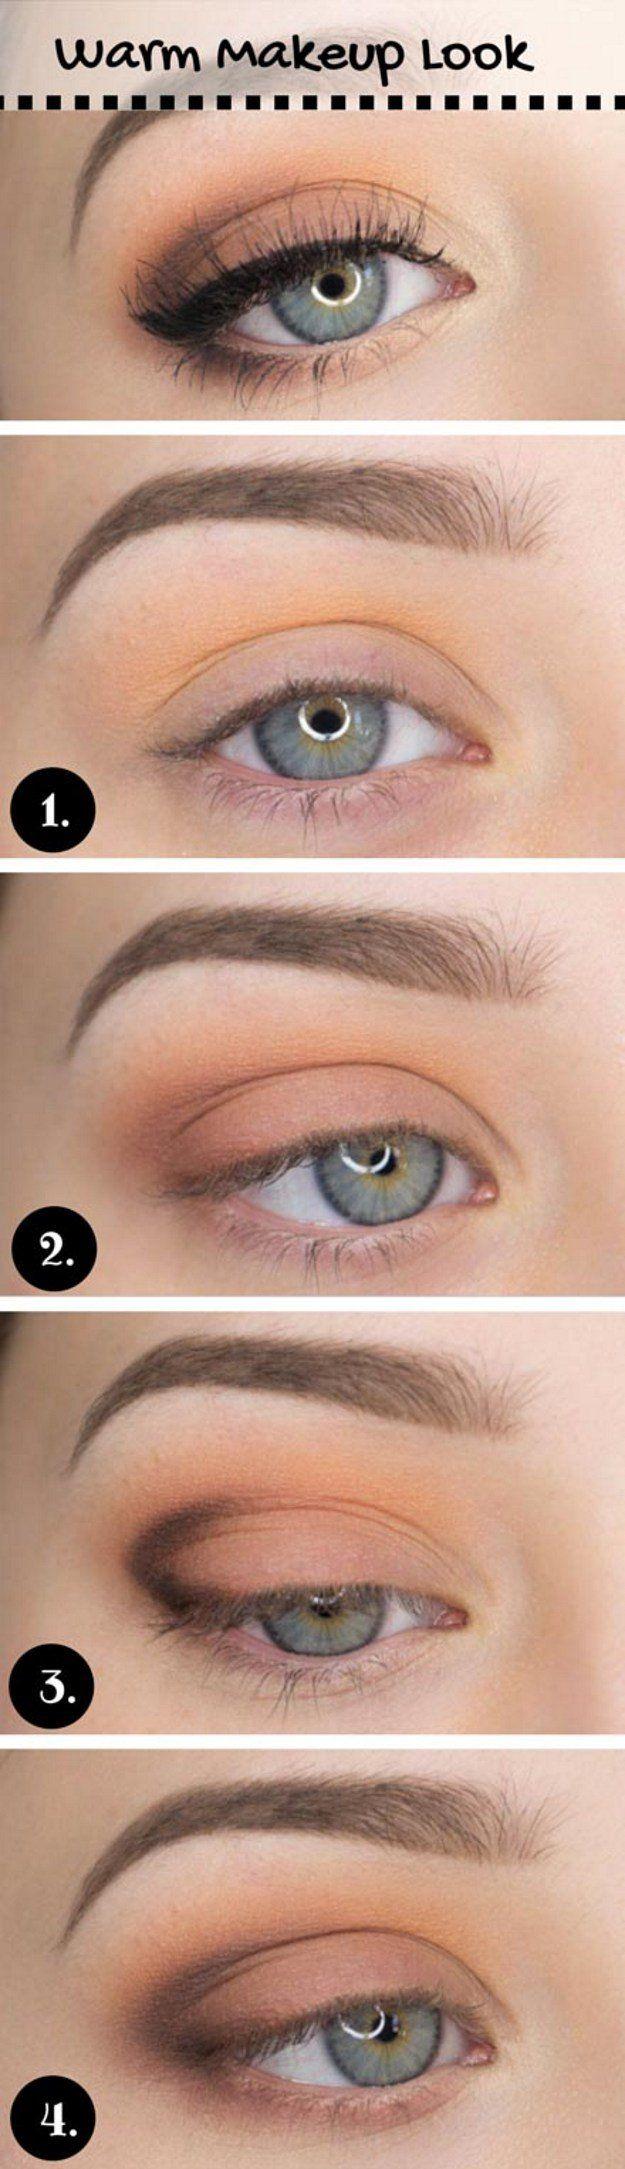 Best 25+ Light blue eyes ideas only on Pinterest | Blue eyeshadow ...